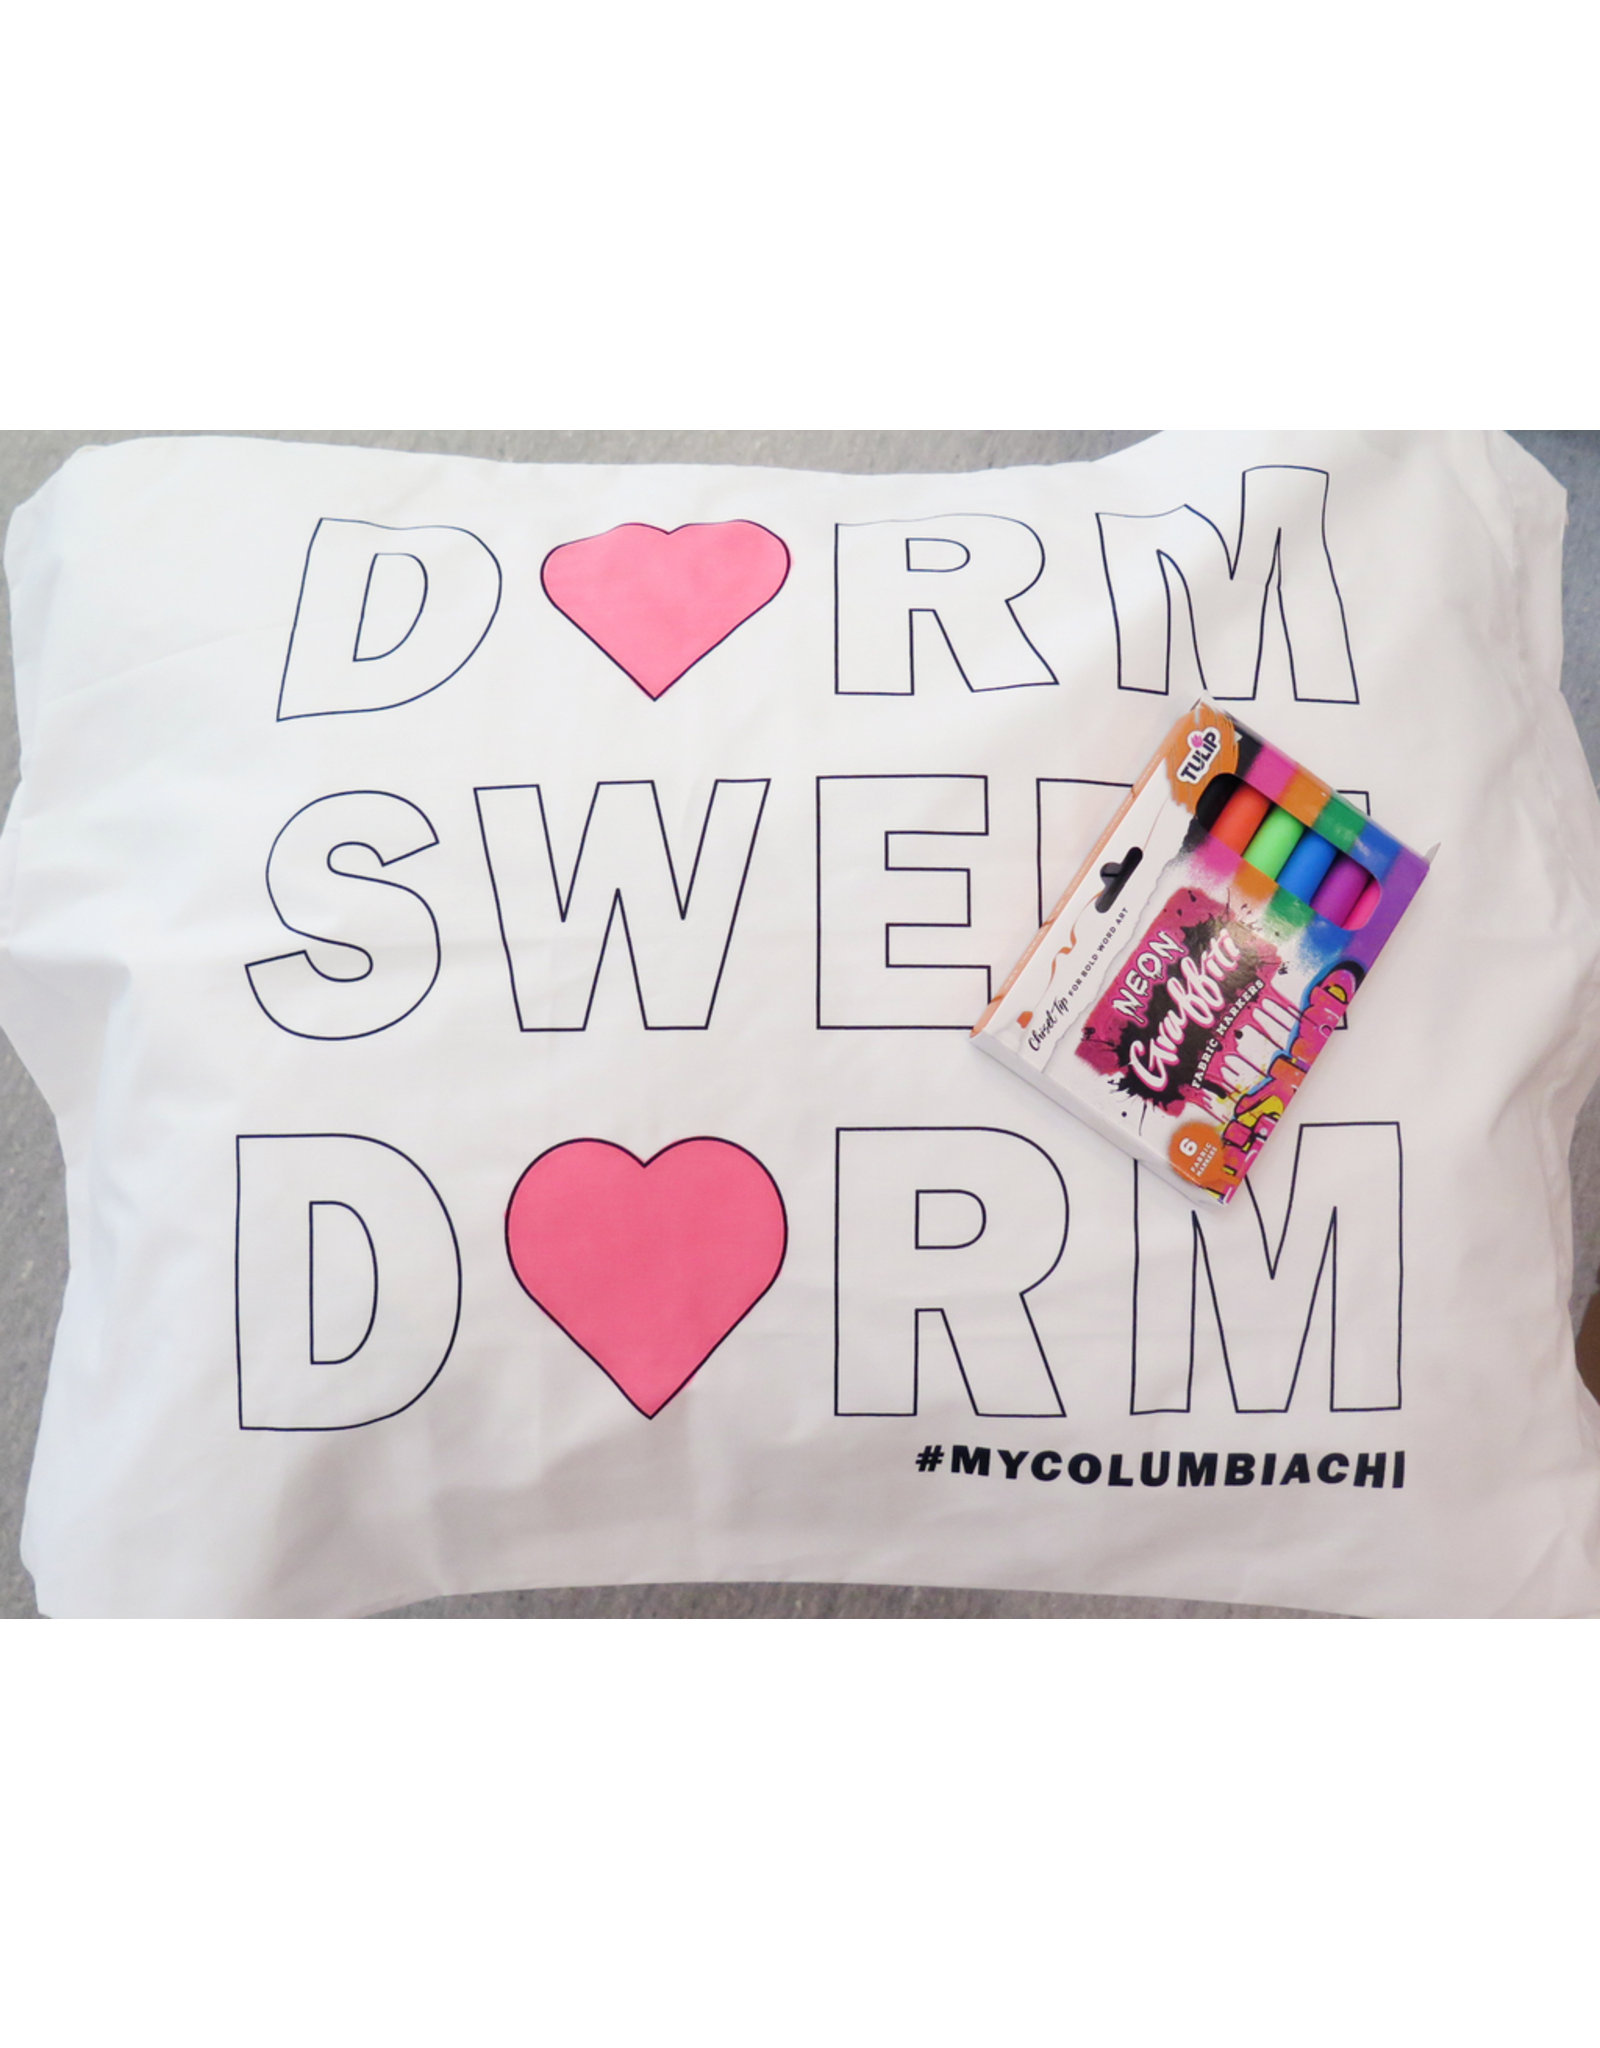 Shop Gift Box Shop Gift Box: Dorm Sweet Dorm